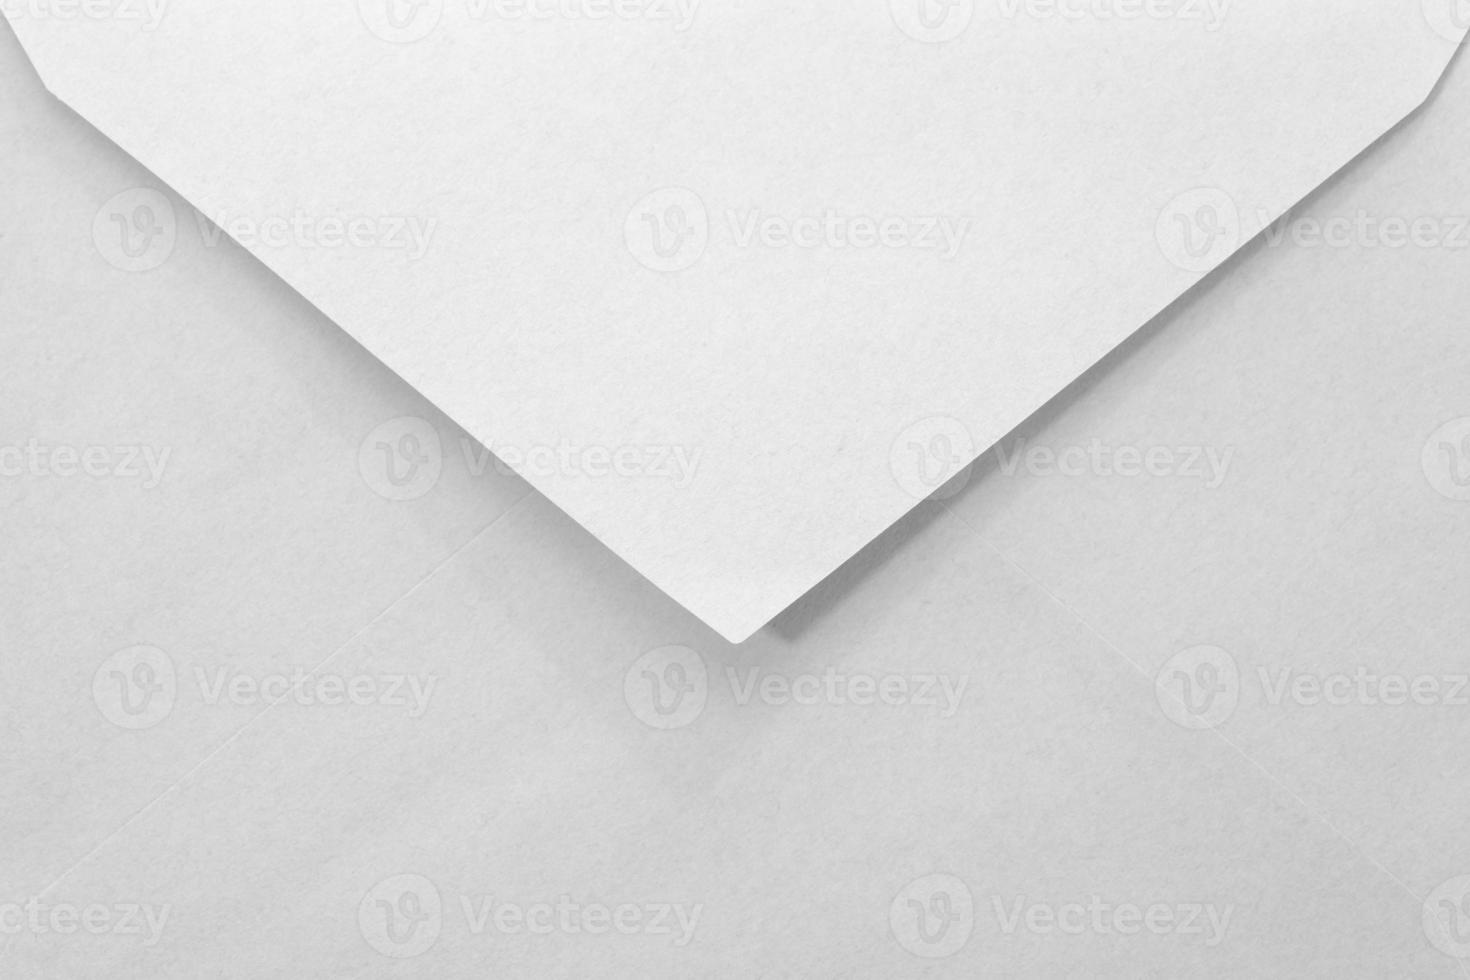 närbild tomma tomma pappers kuvert foto